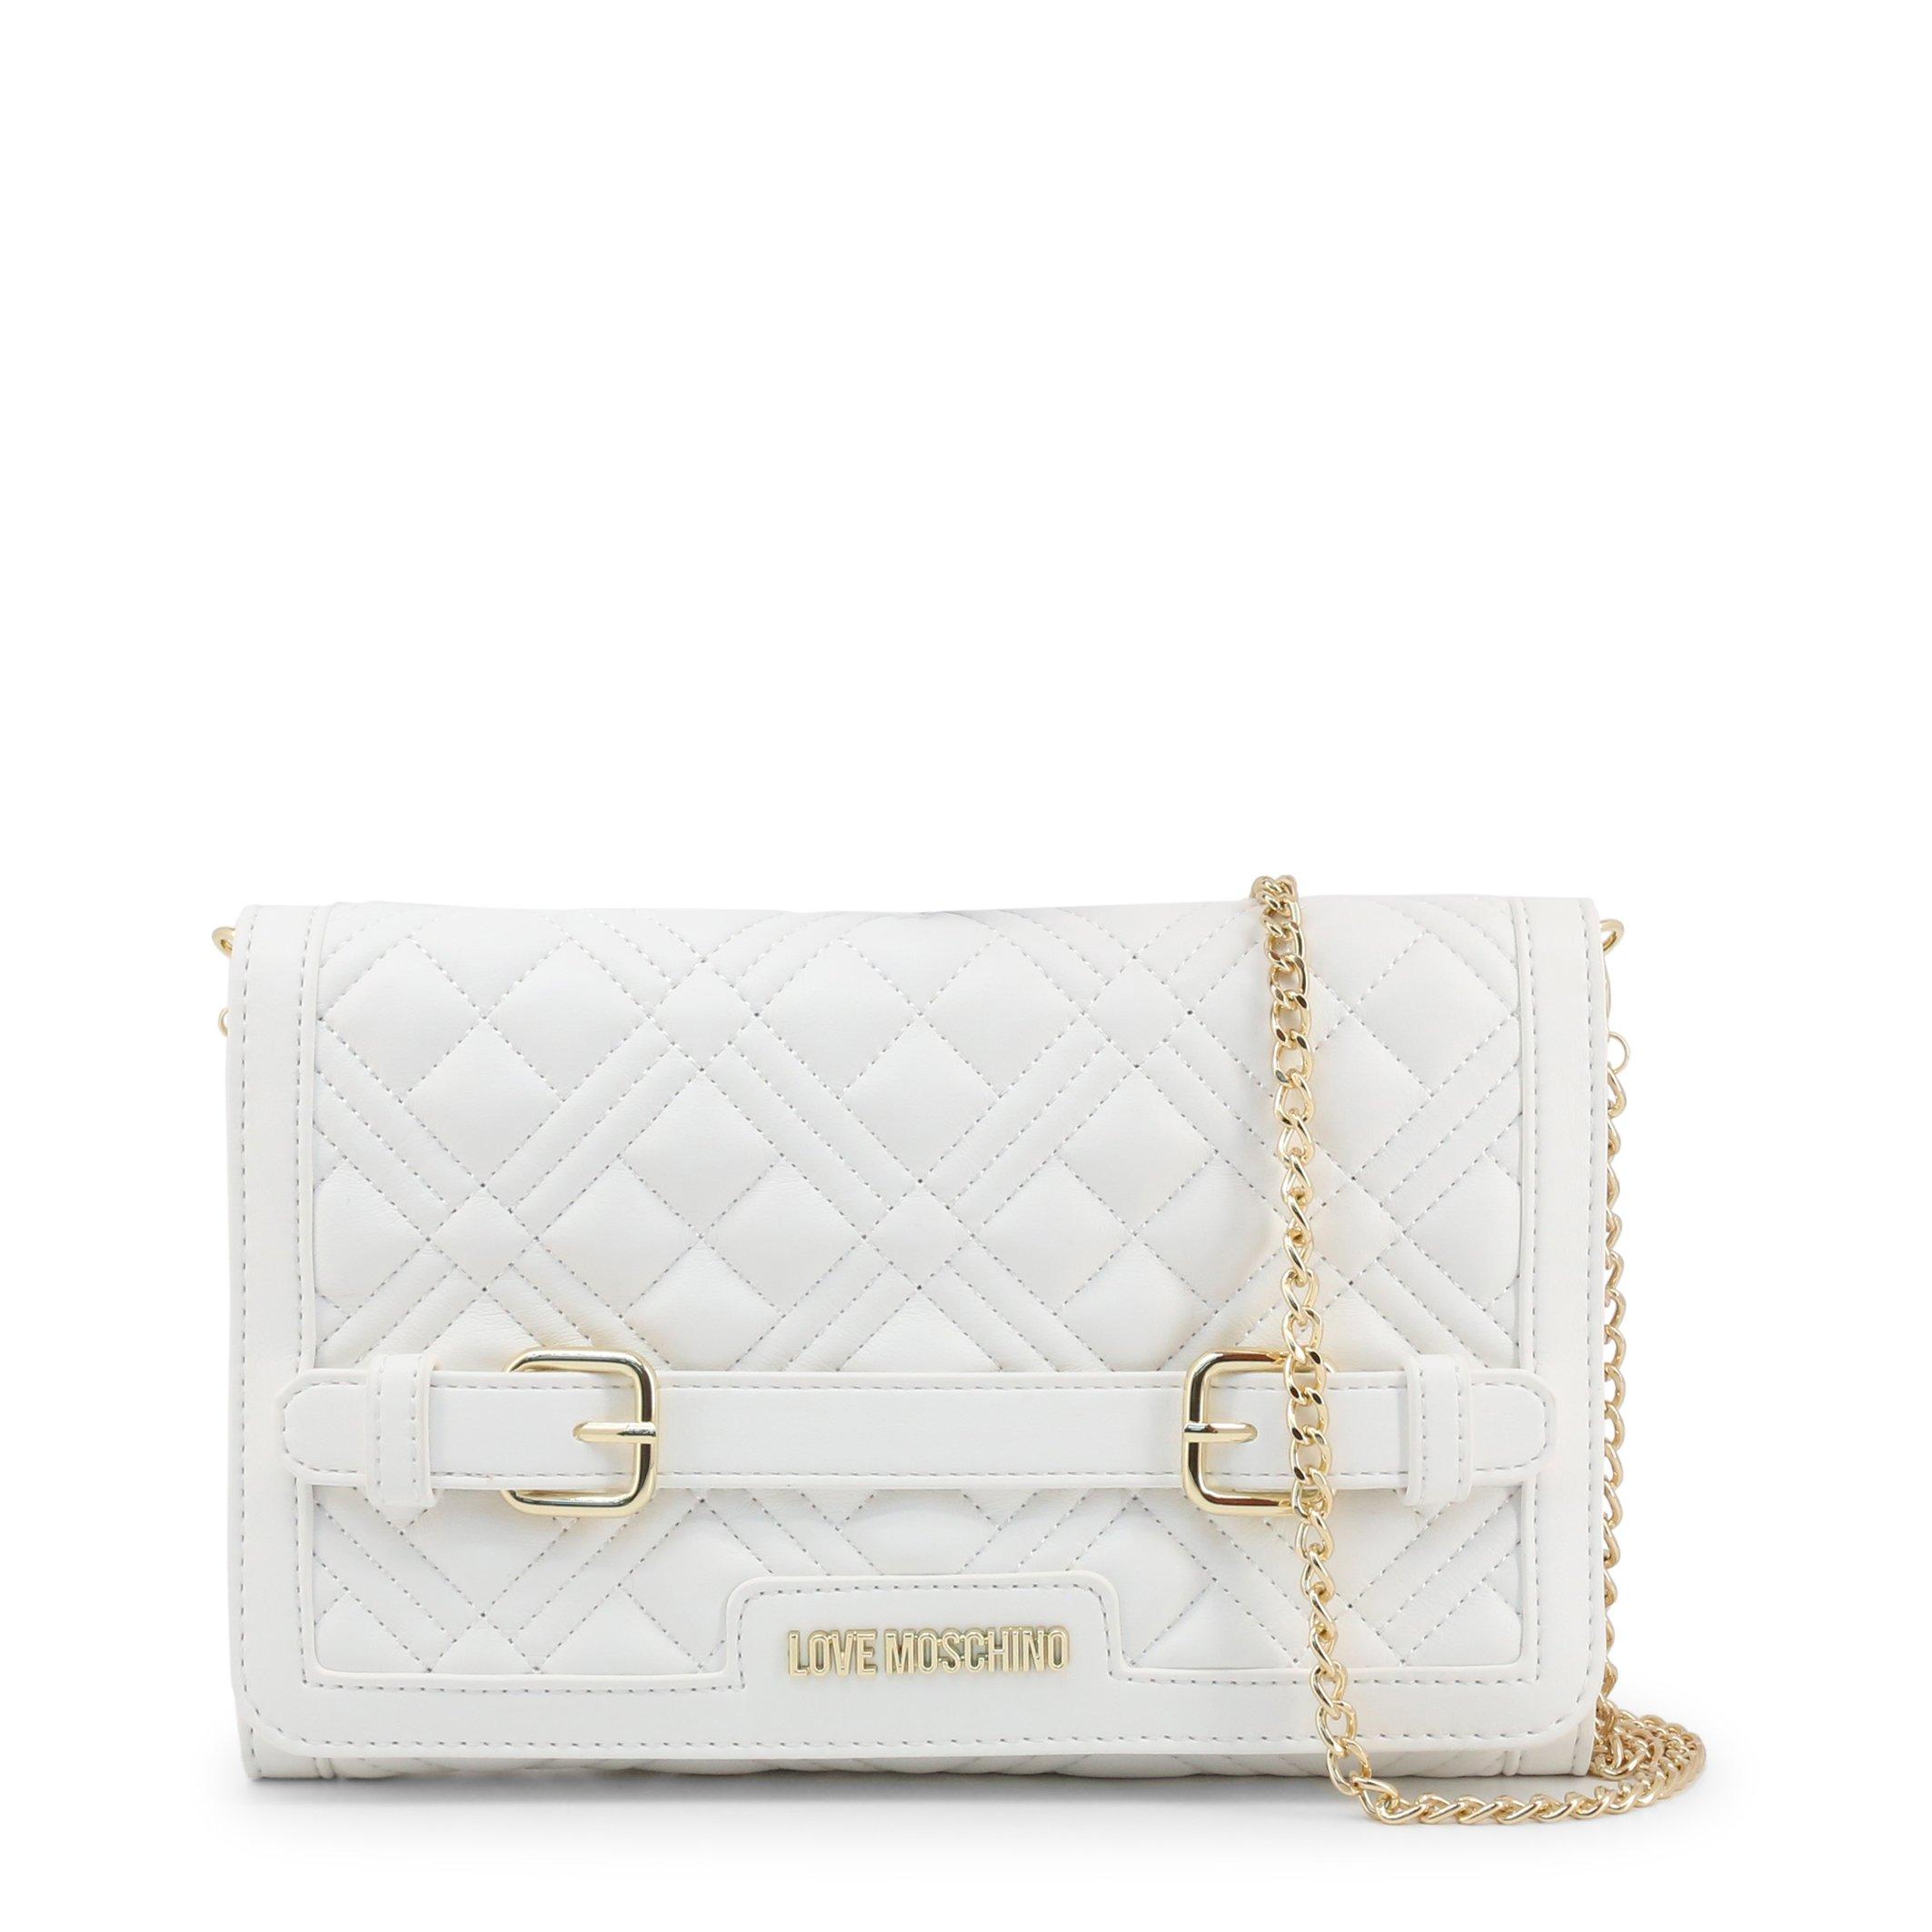 Love Moschino Women's Crossbody Bag Various Colours JC4129PP1CLA2 - white NOSIZE